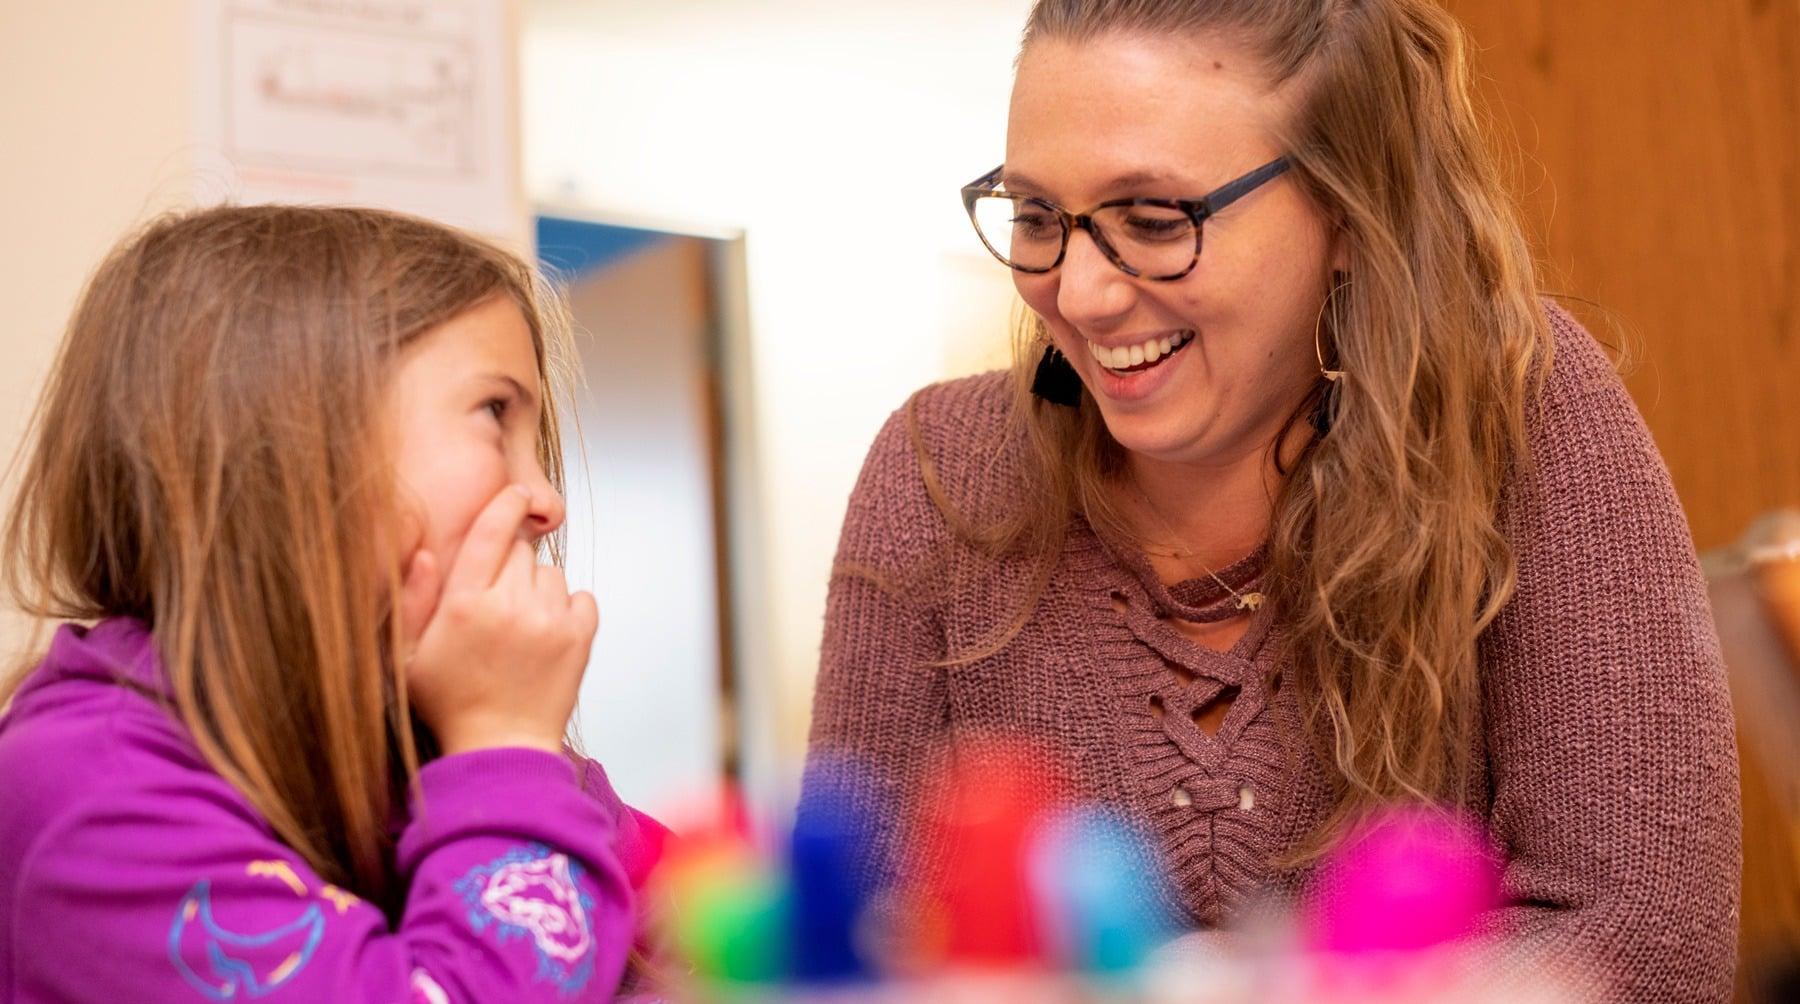 speech-language therapist talking to a student